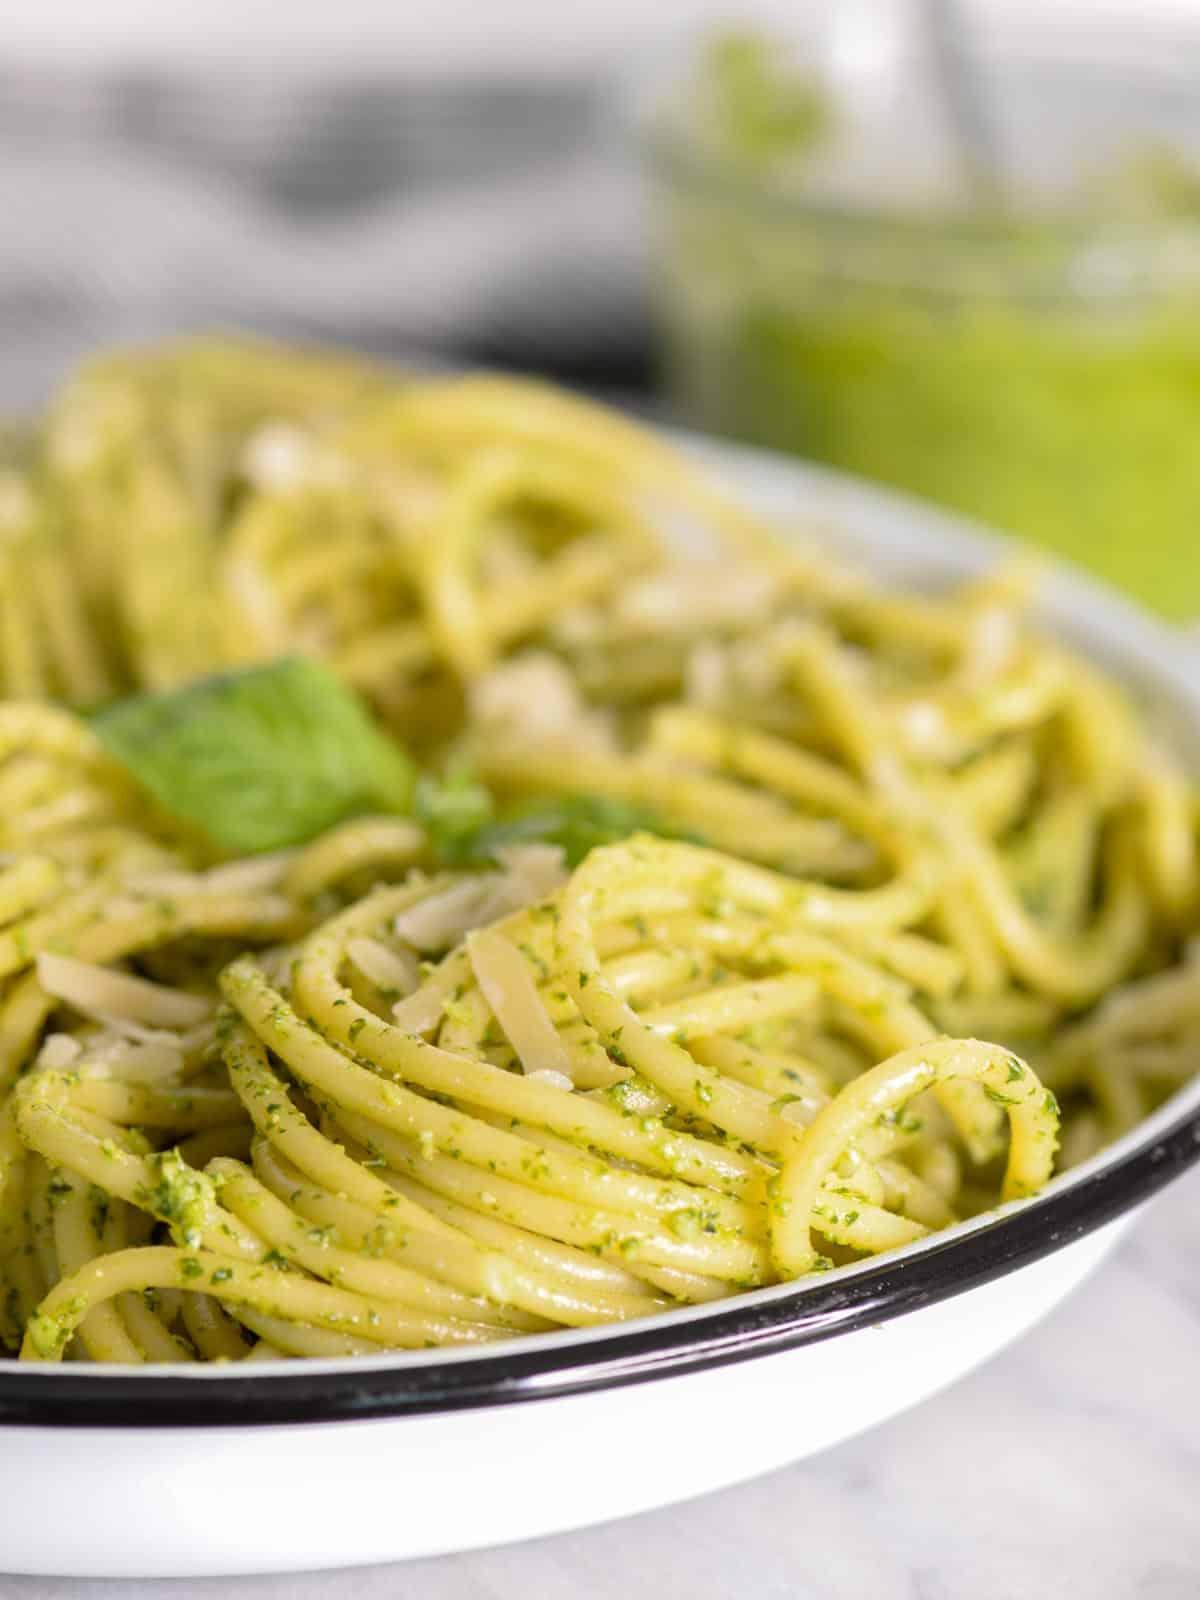 a bowl of pasta with homemade pesto sauce